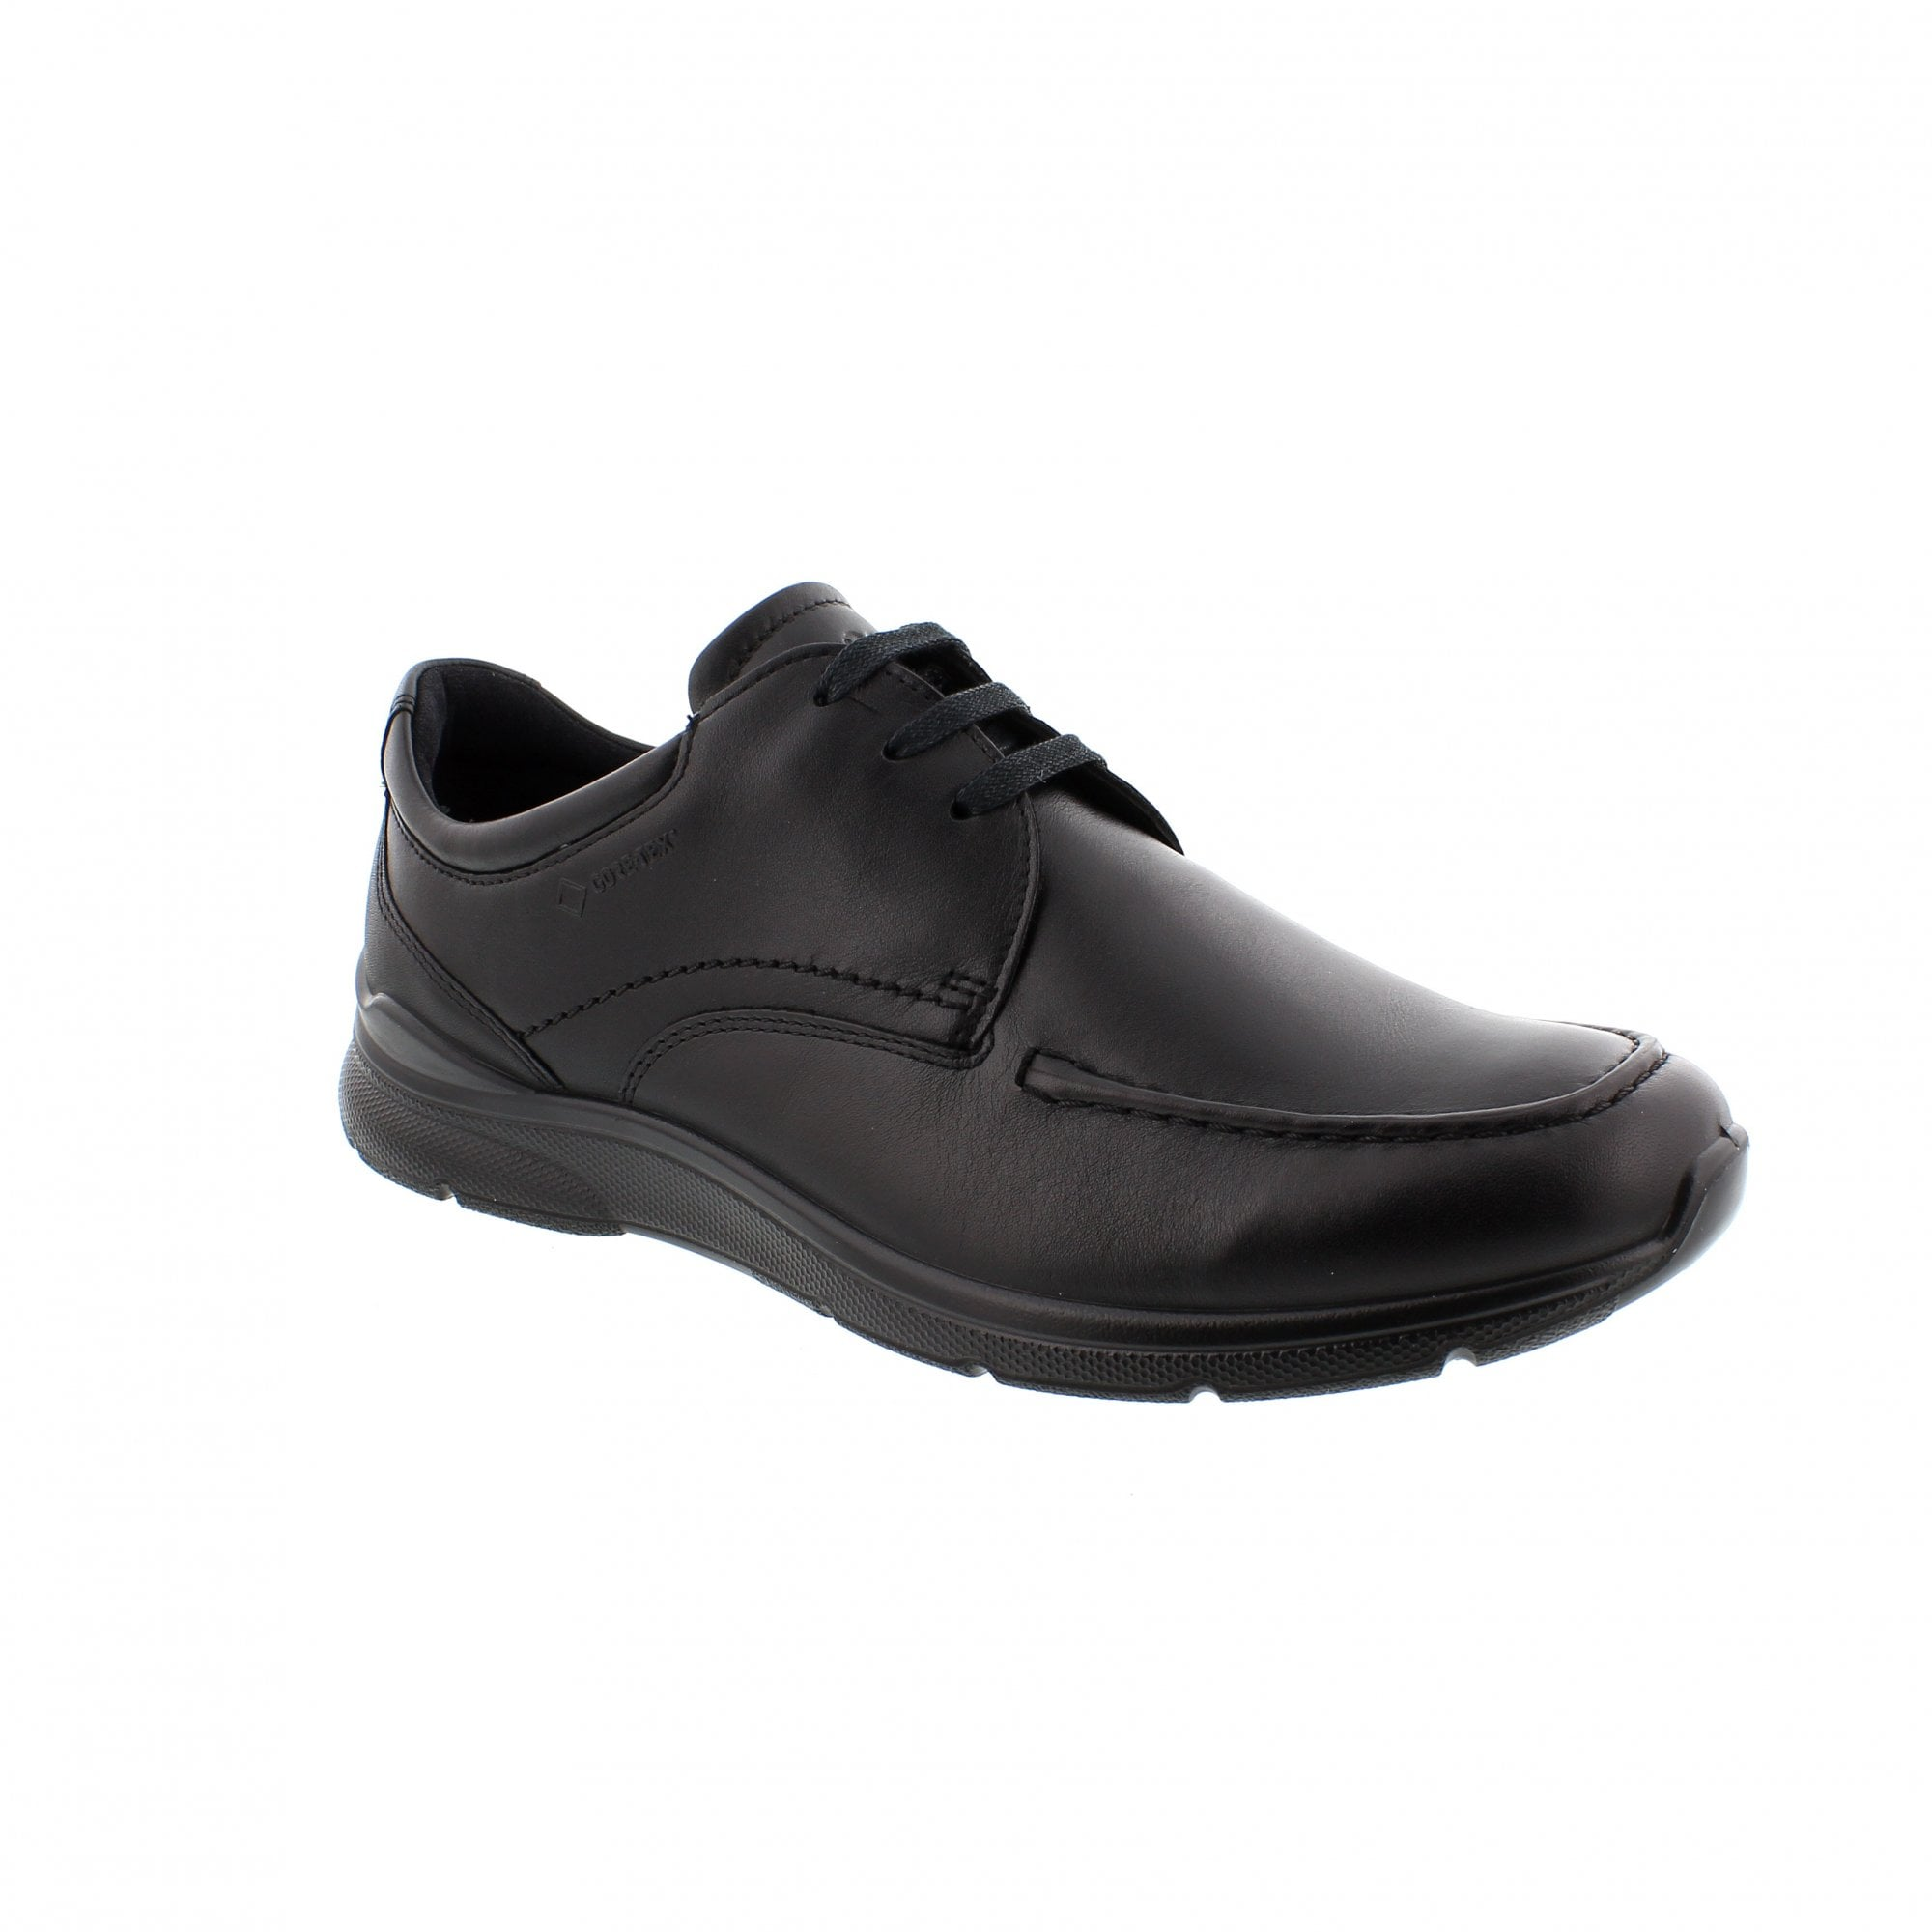 dc357a038500 Ecco Irving 511574-01001 Mens Lace Up Shoes